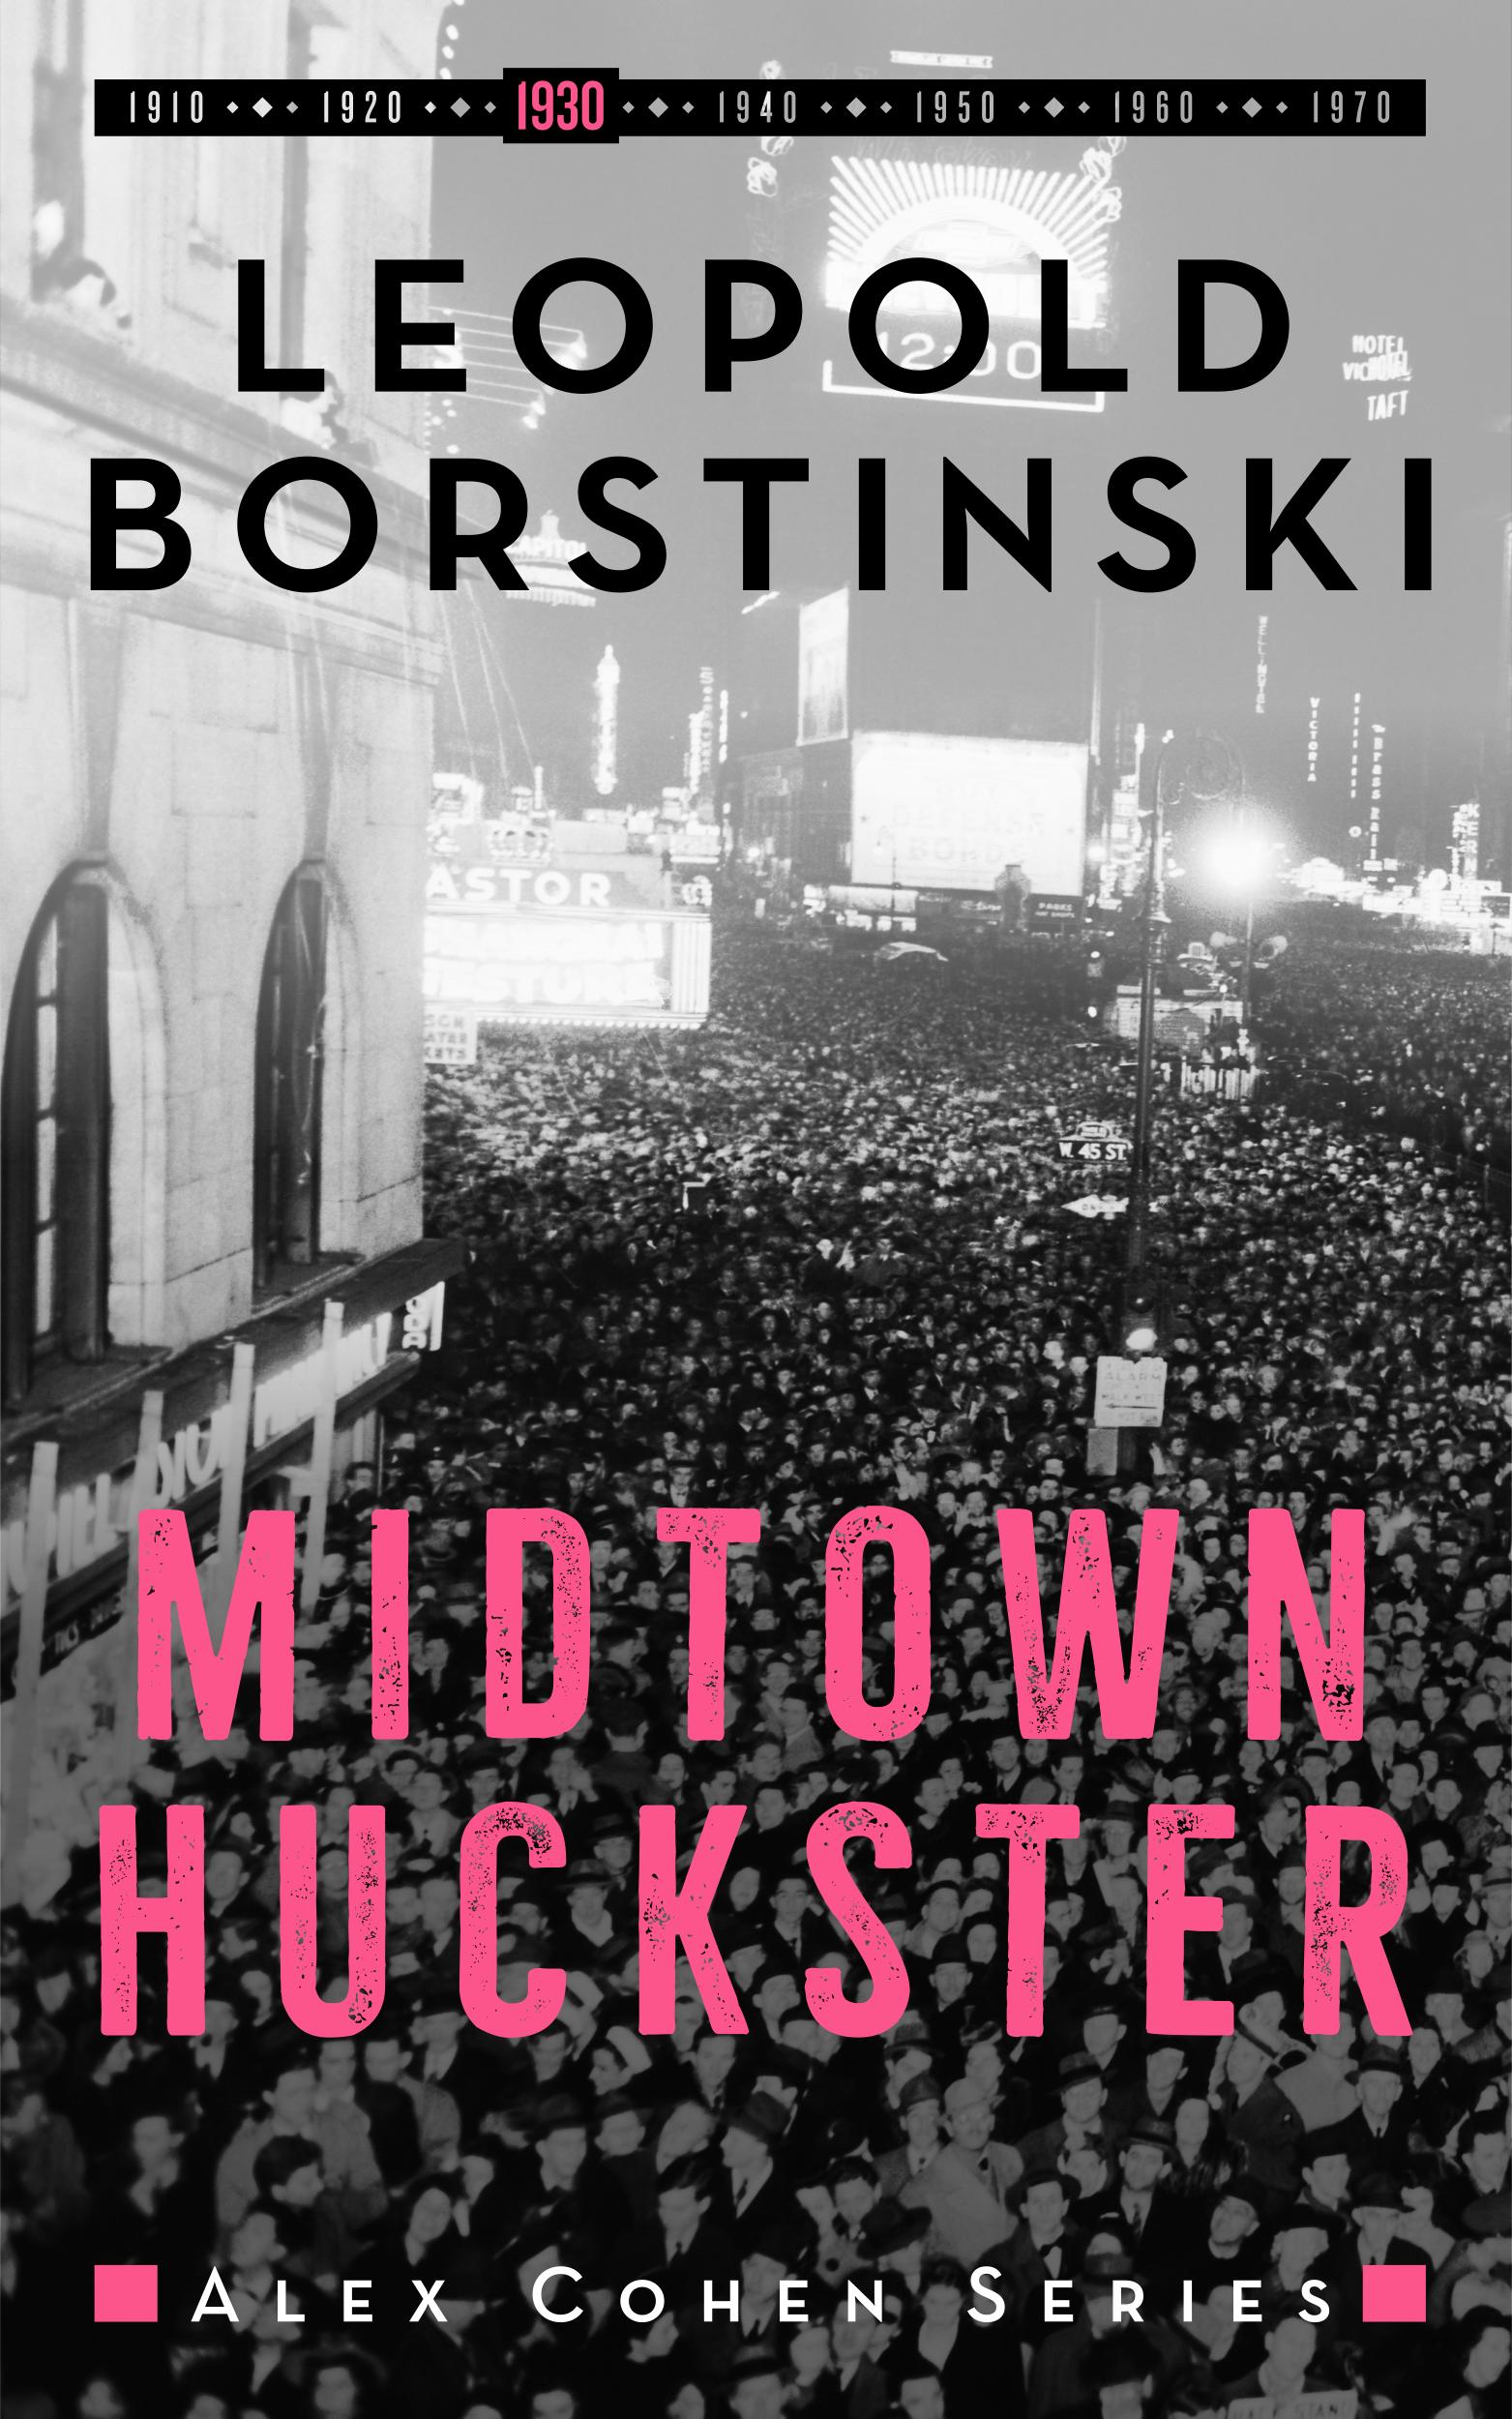 3 Midtown Huckster High Res 1930